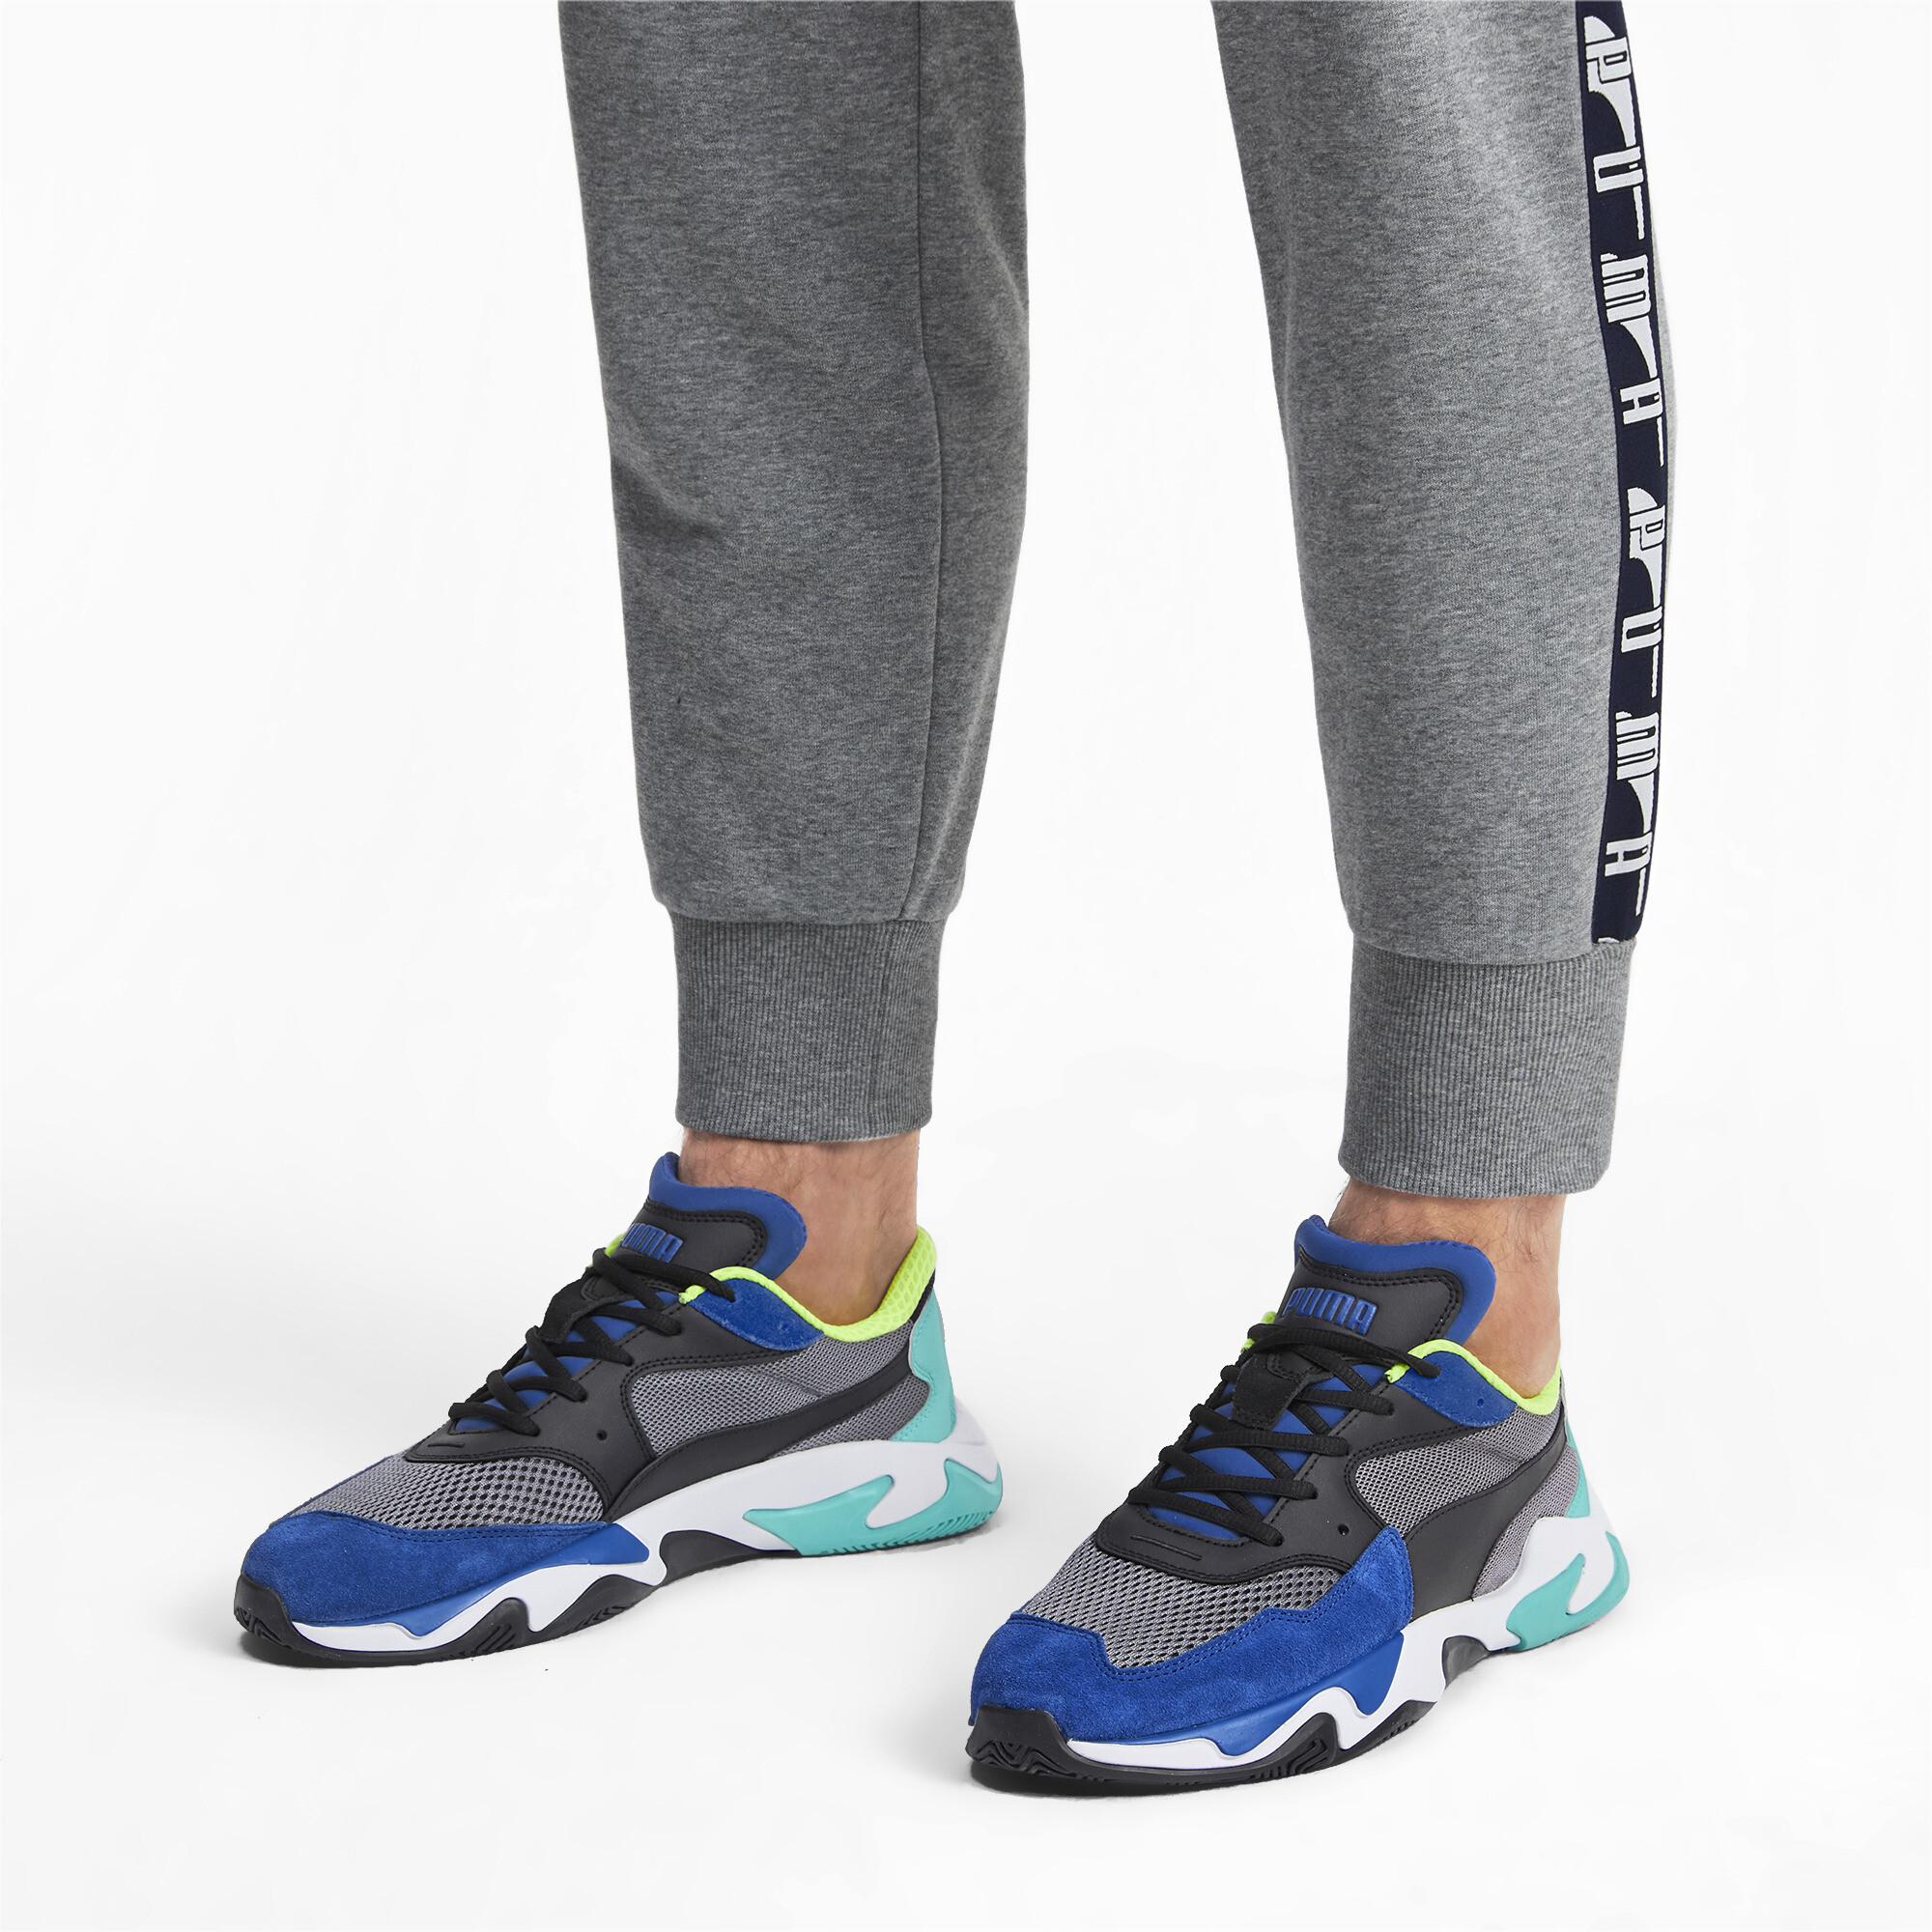 PUMA-Storm-Origin-Sneakers-Unisex-Shoe-Evolution thumbnail 12